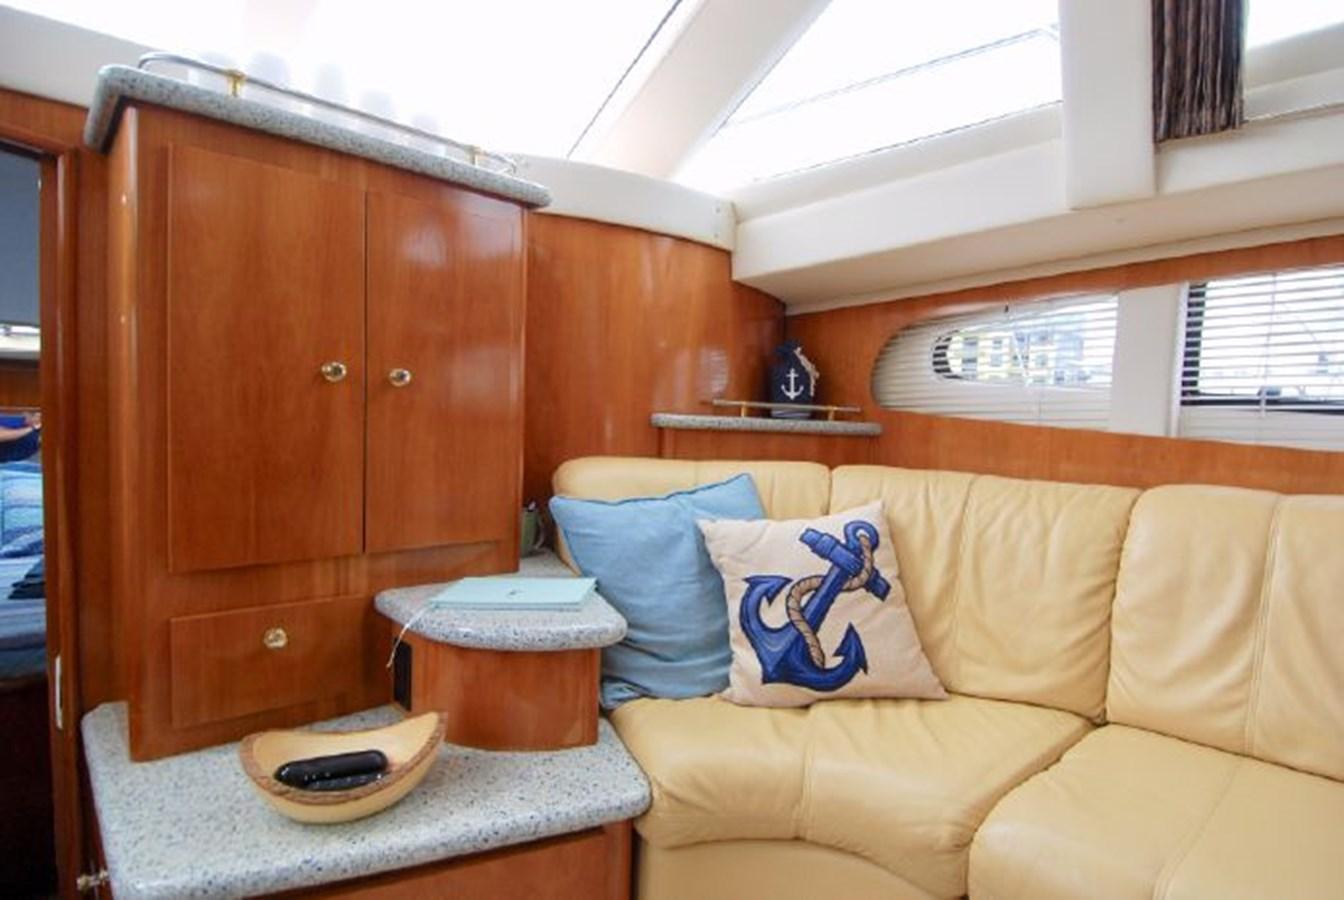 5 2001 CARVER 444 Cockpit Motor yacht Motor Yacht 2885781